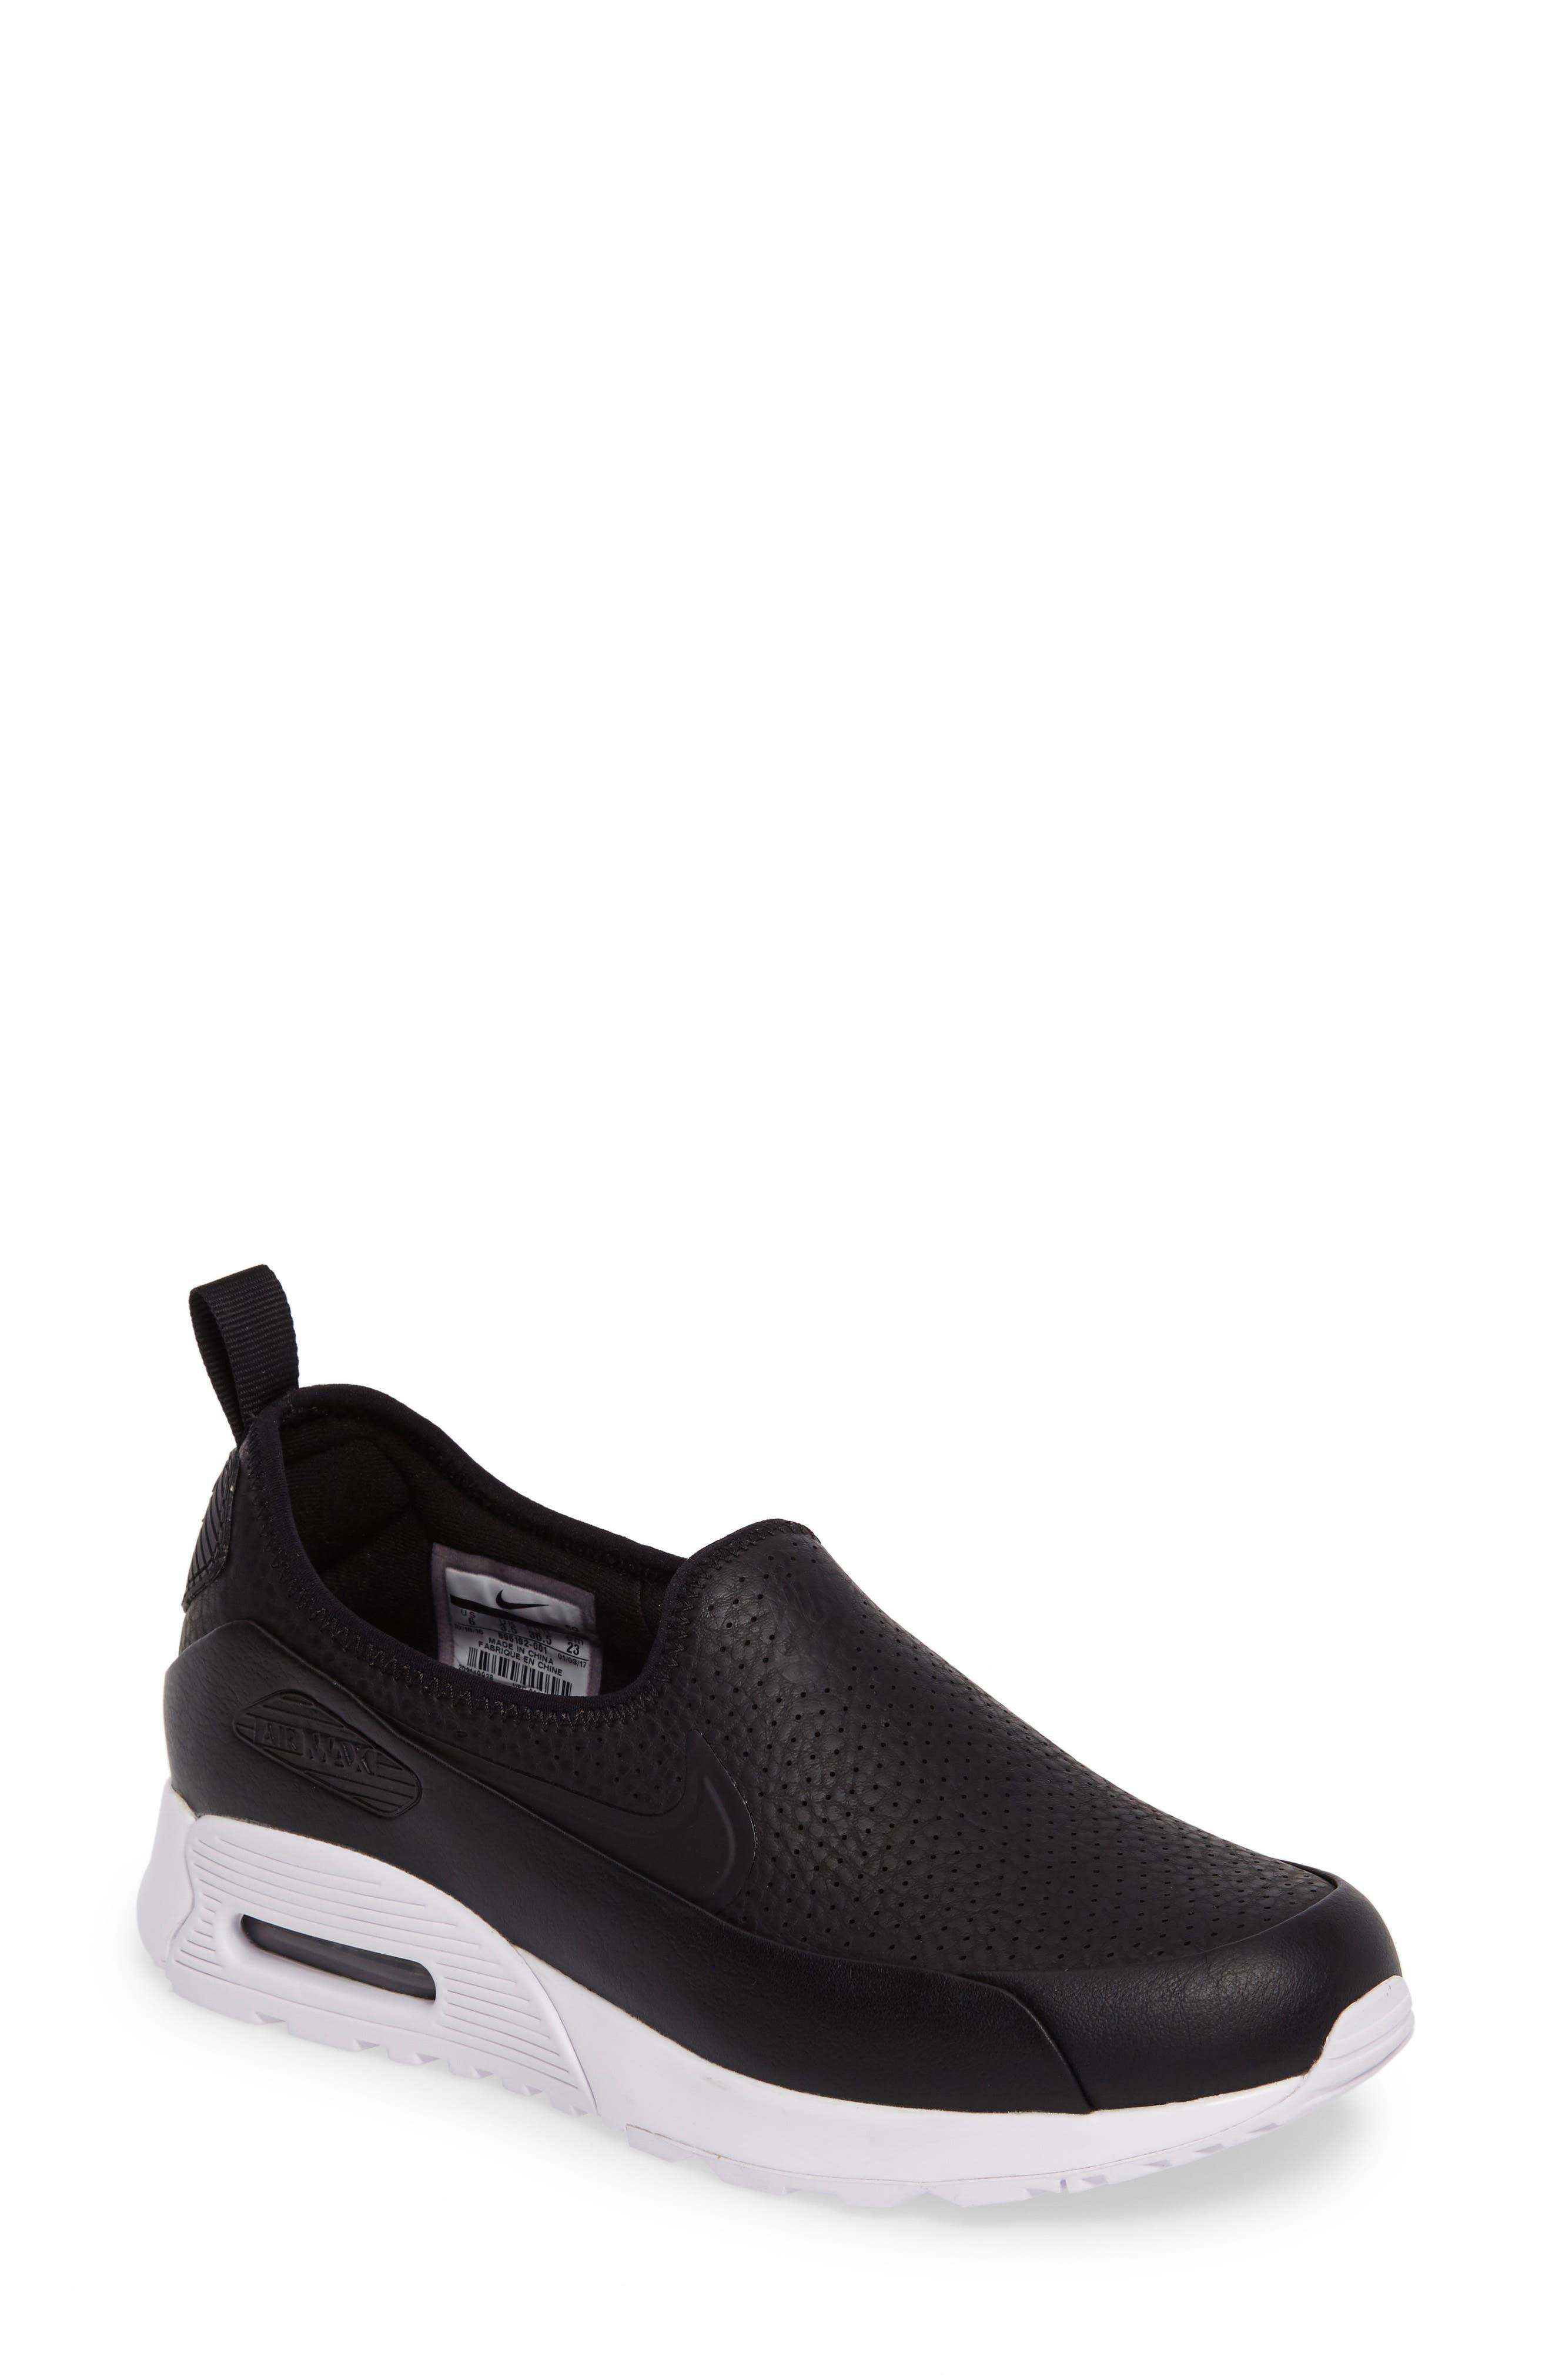 Nike Air Max 90 Ultra 2.0 Slip-On